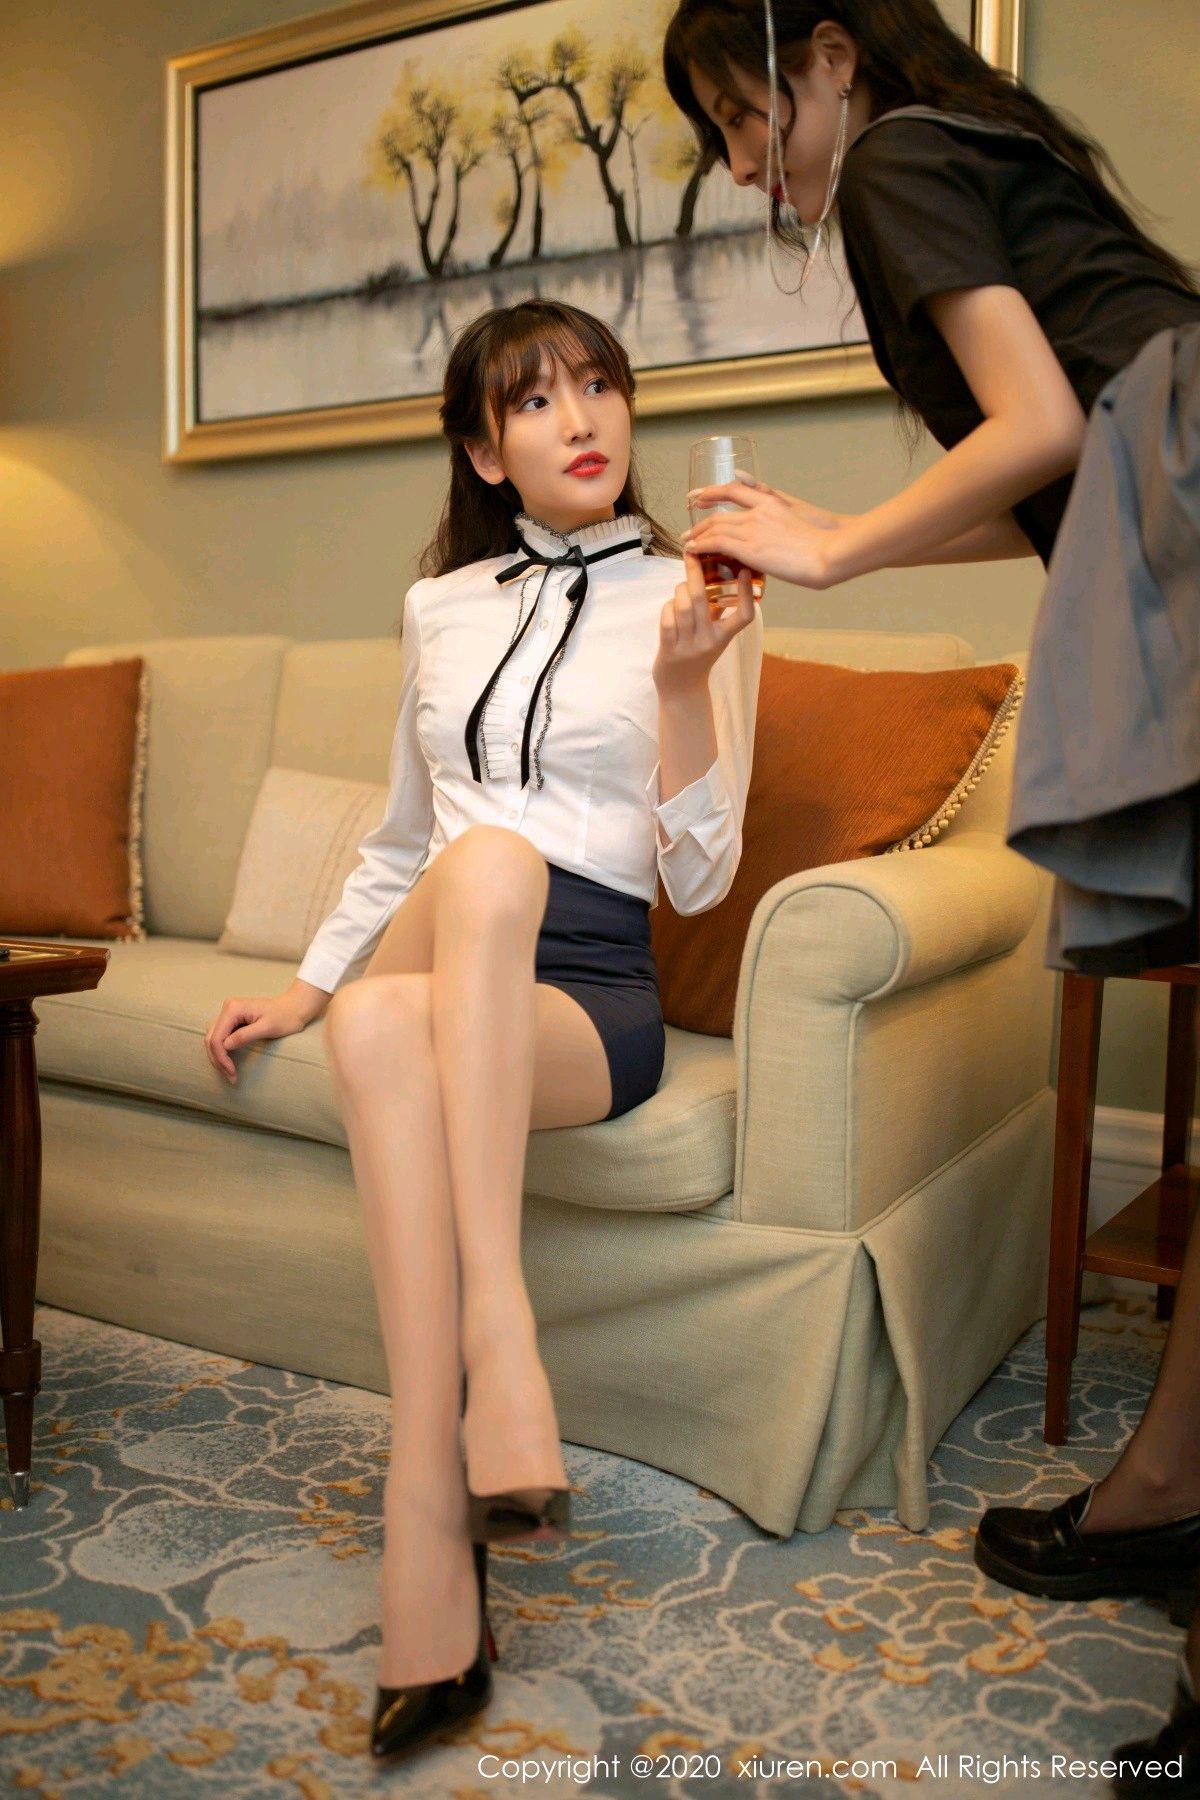 [XiuRen] Vol.2626 Secrets in mobile phones 7P, Chen Xiao Miao, Lu Xuan Xuan, School Uniform, Sisters, Xiuren